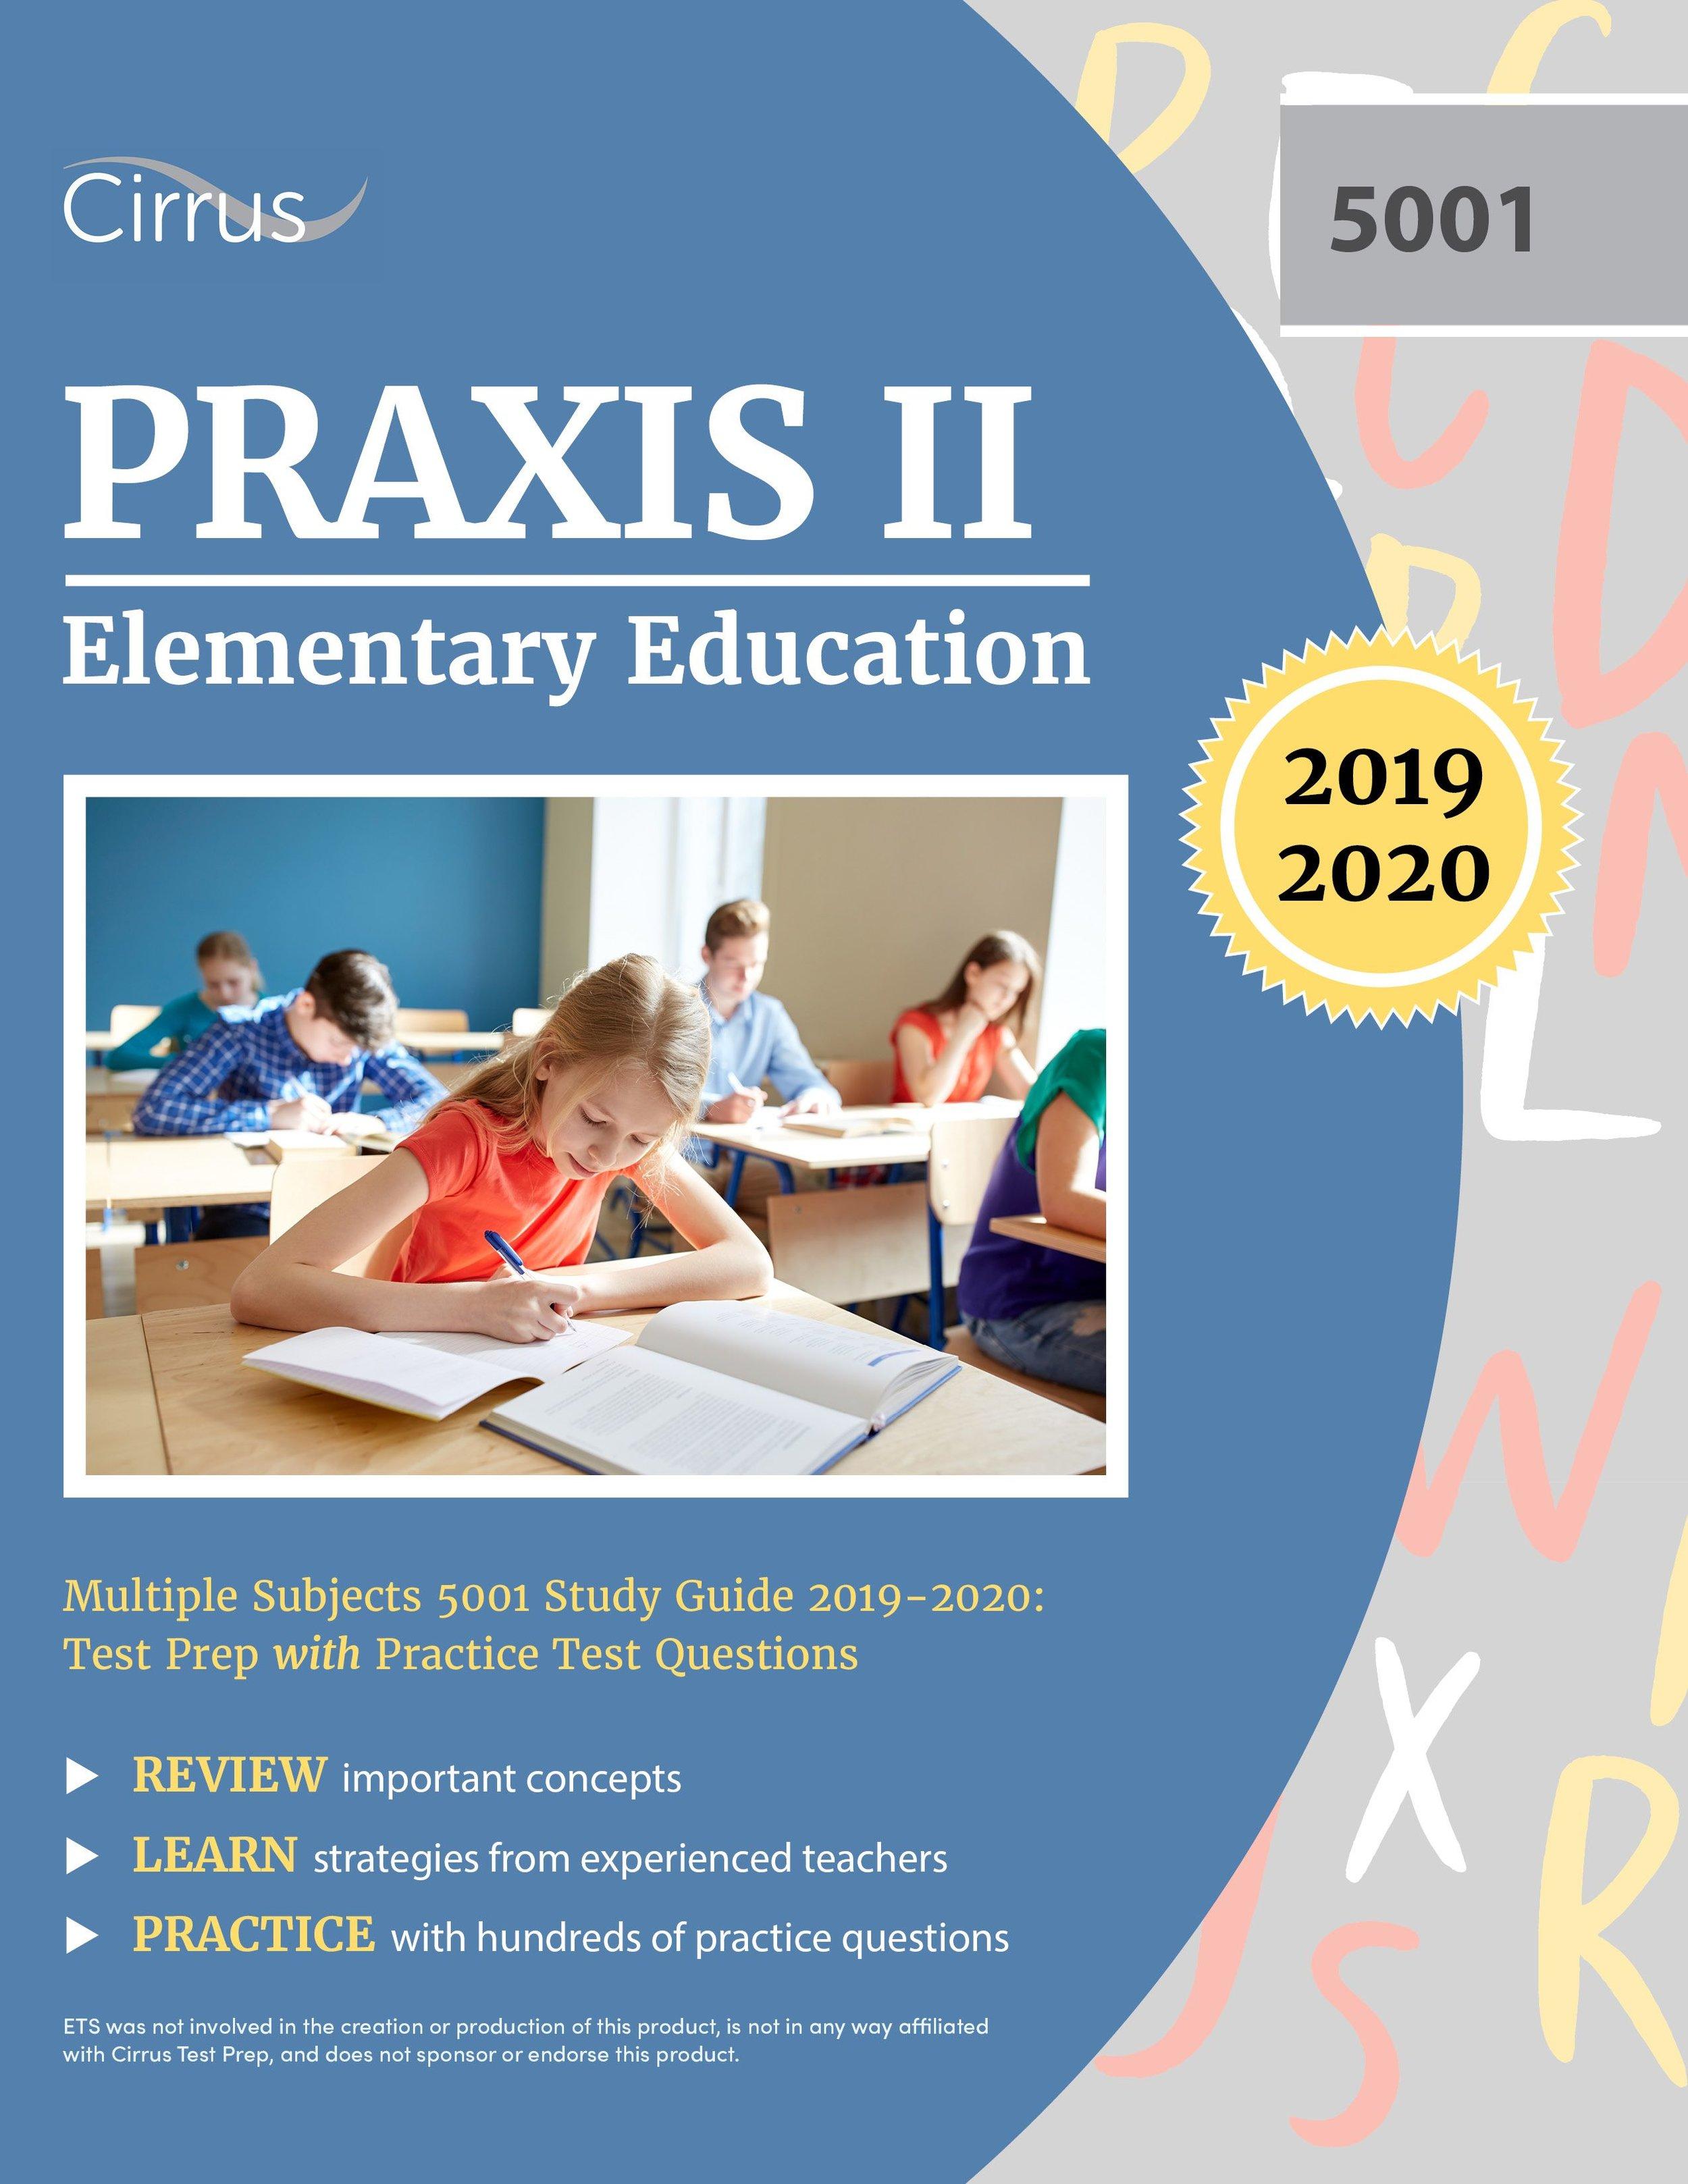 Praxis Elementary Education 5001 — by Cirrus Test Prep